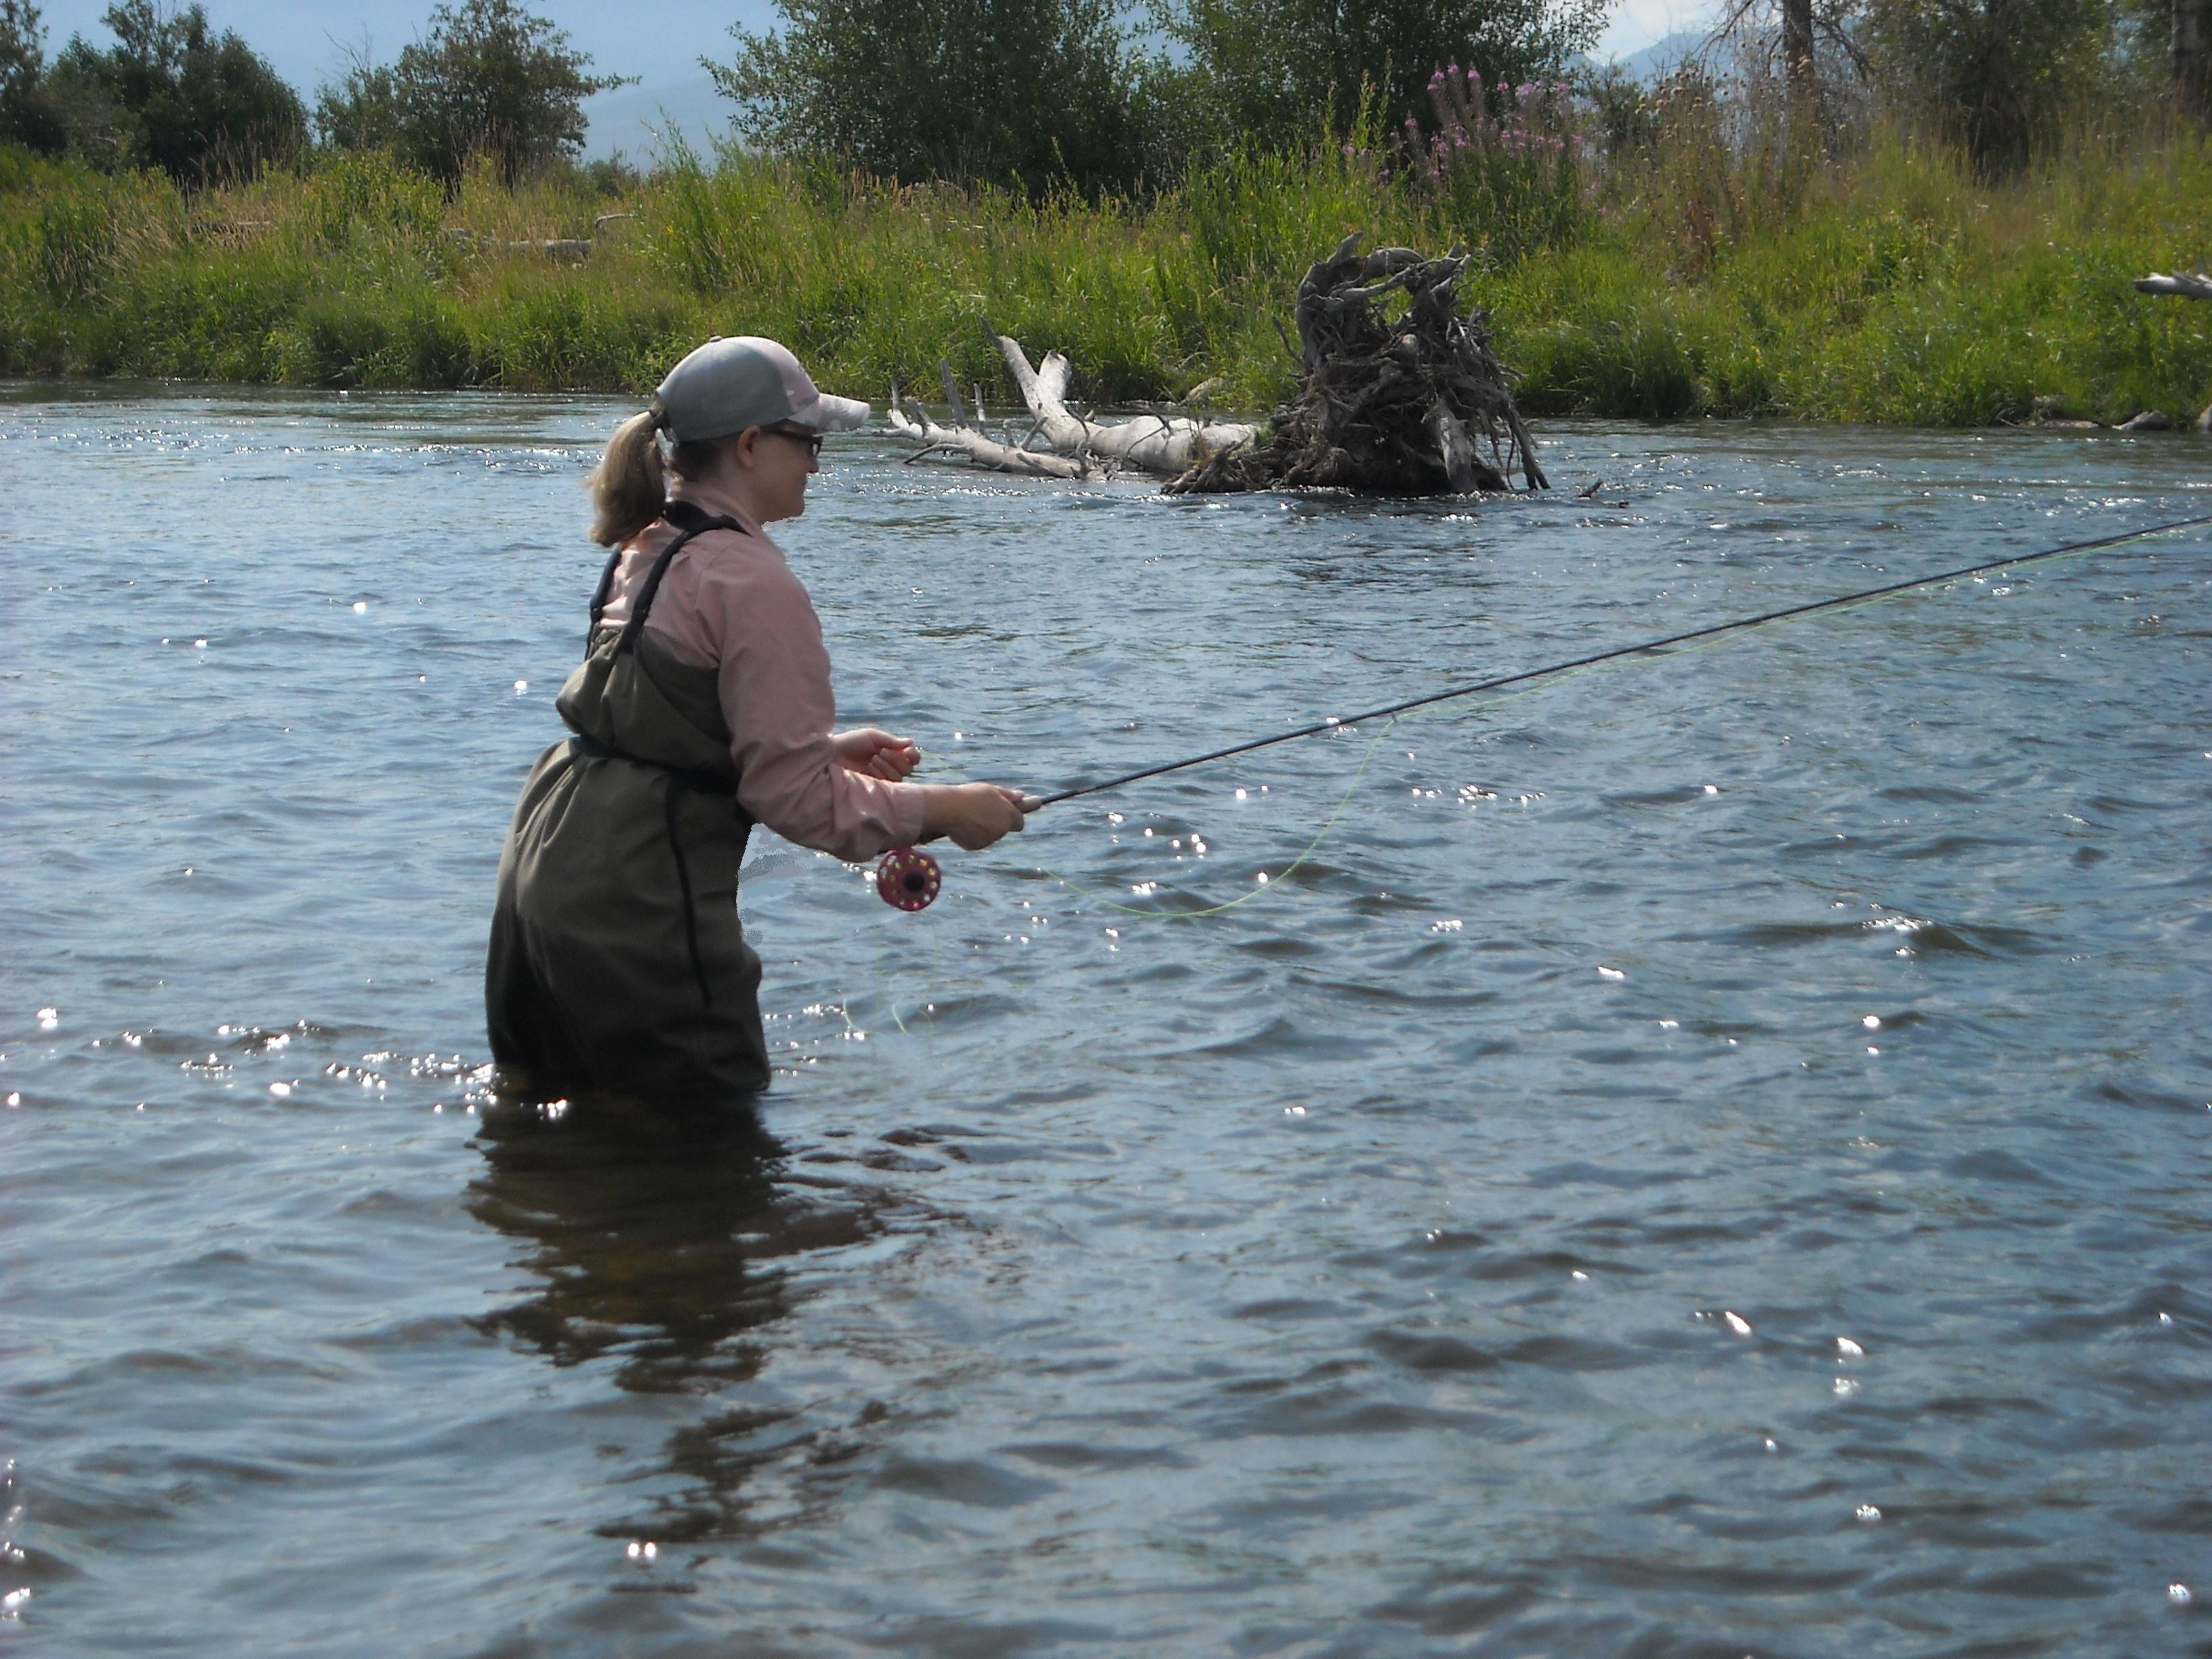 Nick erin 39 s fishing adventures nick erin attardi we for Provo river fly fishing